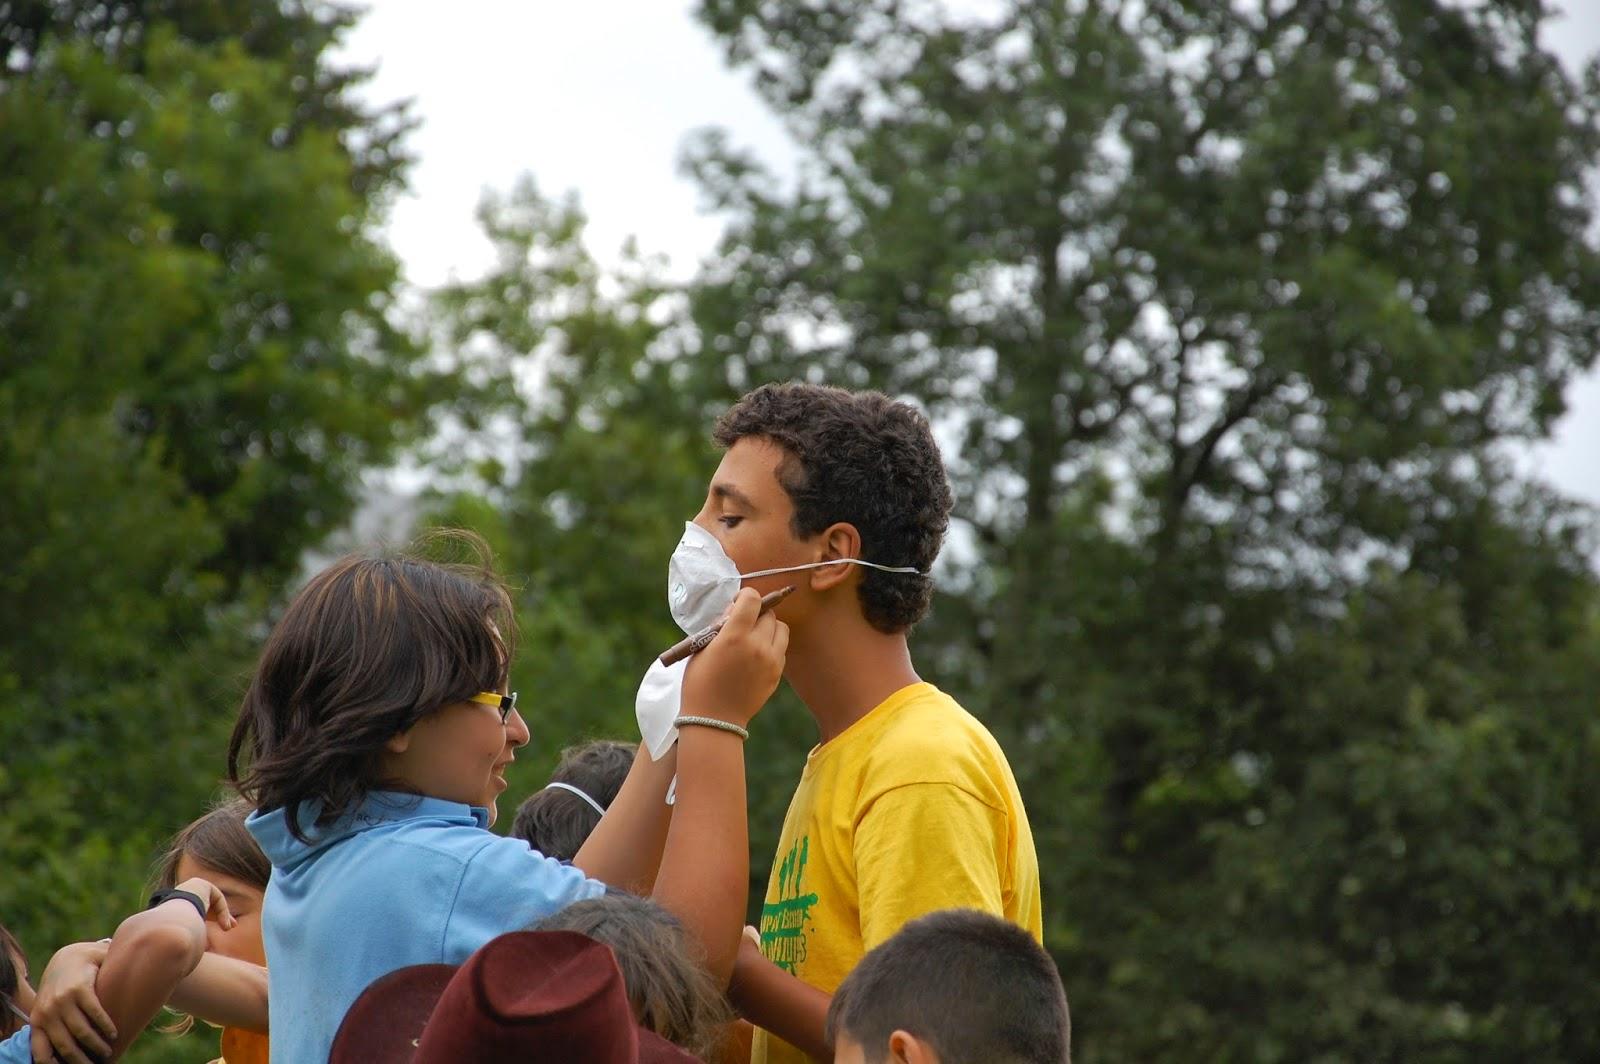 Campaments Estiu RolandKing 2011 - DSC_0148%2B2.JPG